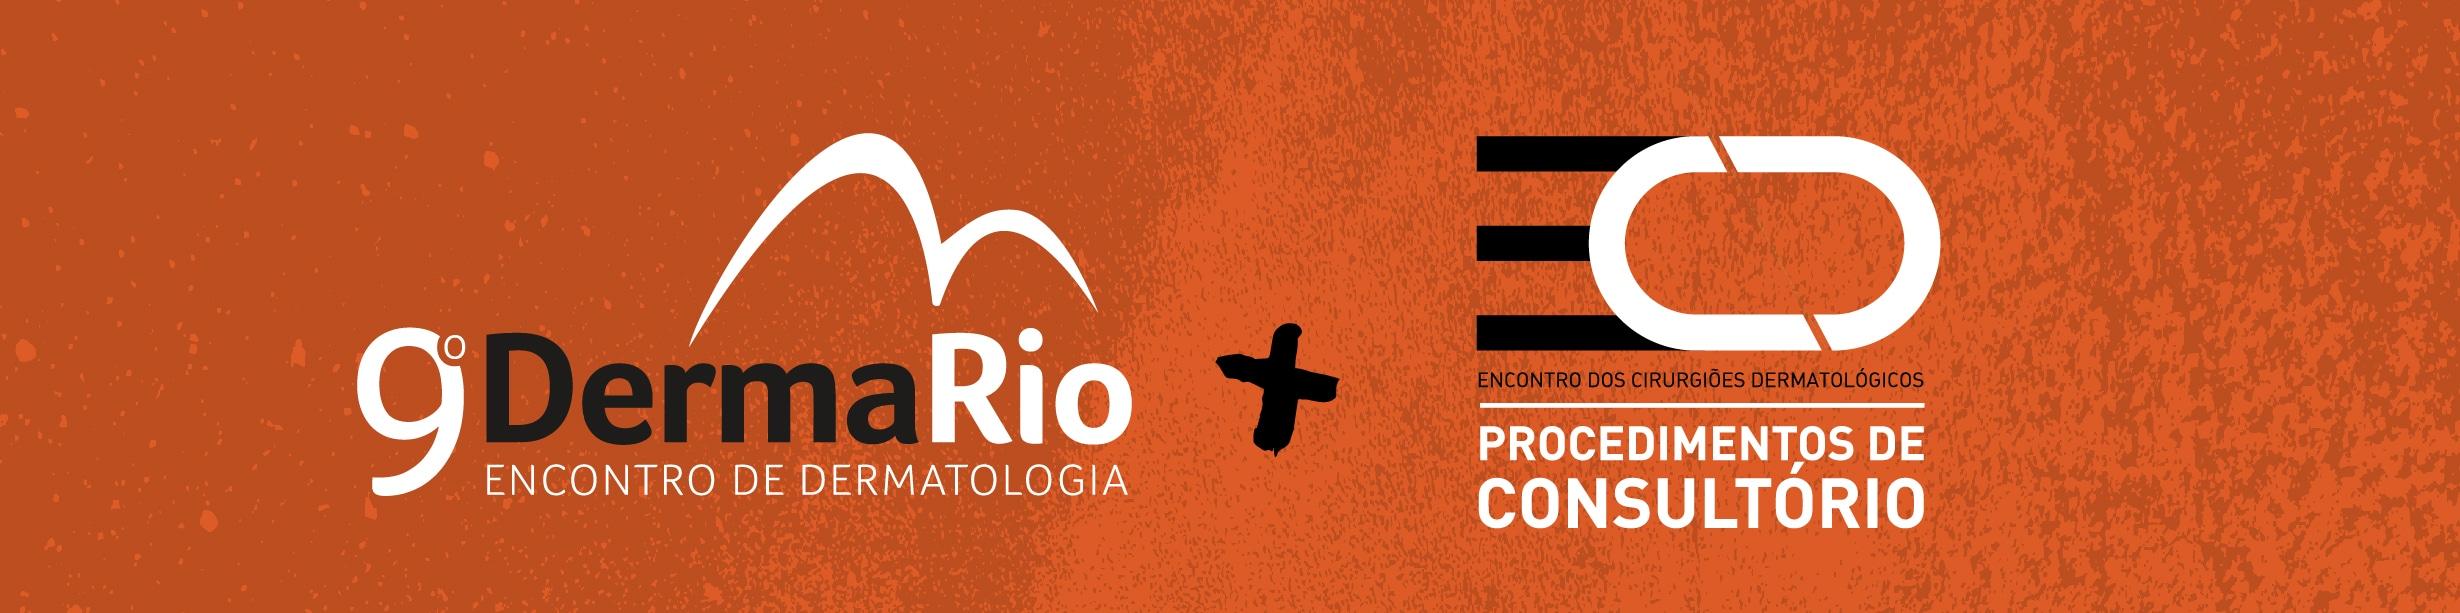 9º Dermario & ECD – Procedimentos de Consultório @ Windsor Barra | Rio de Janeiro | Brasil